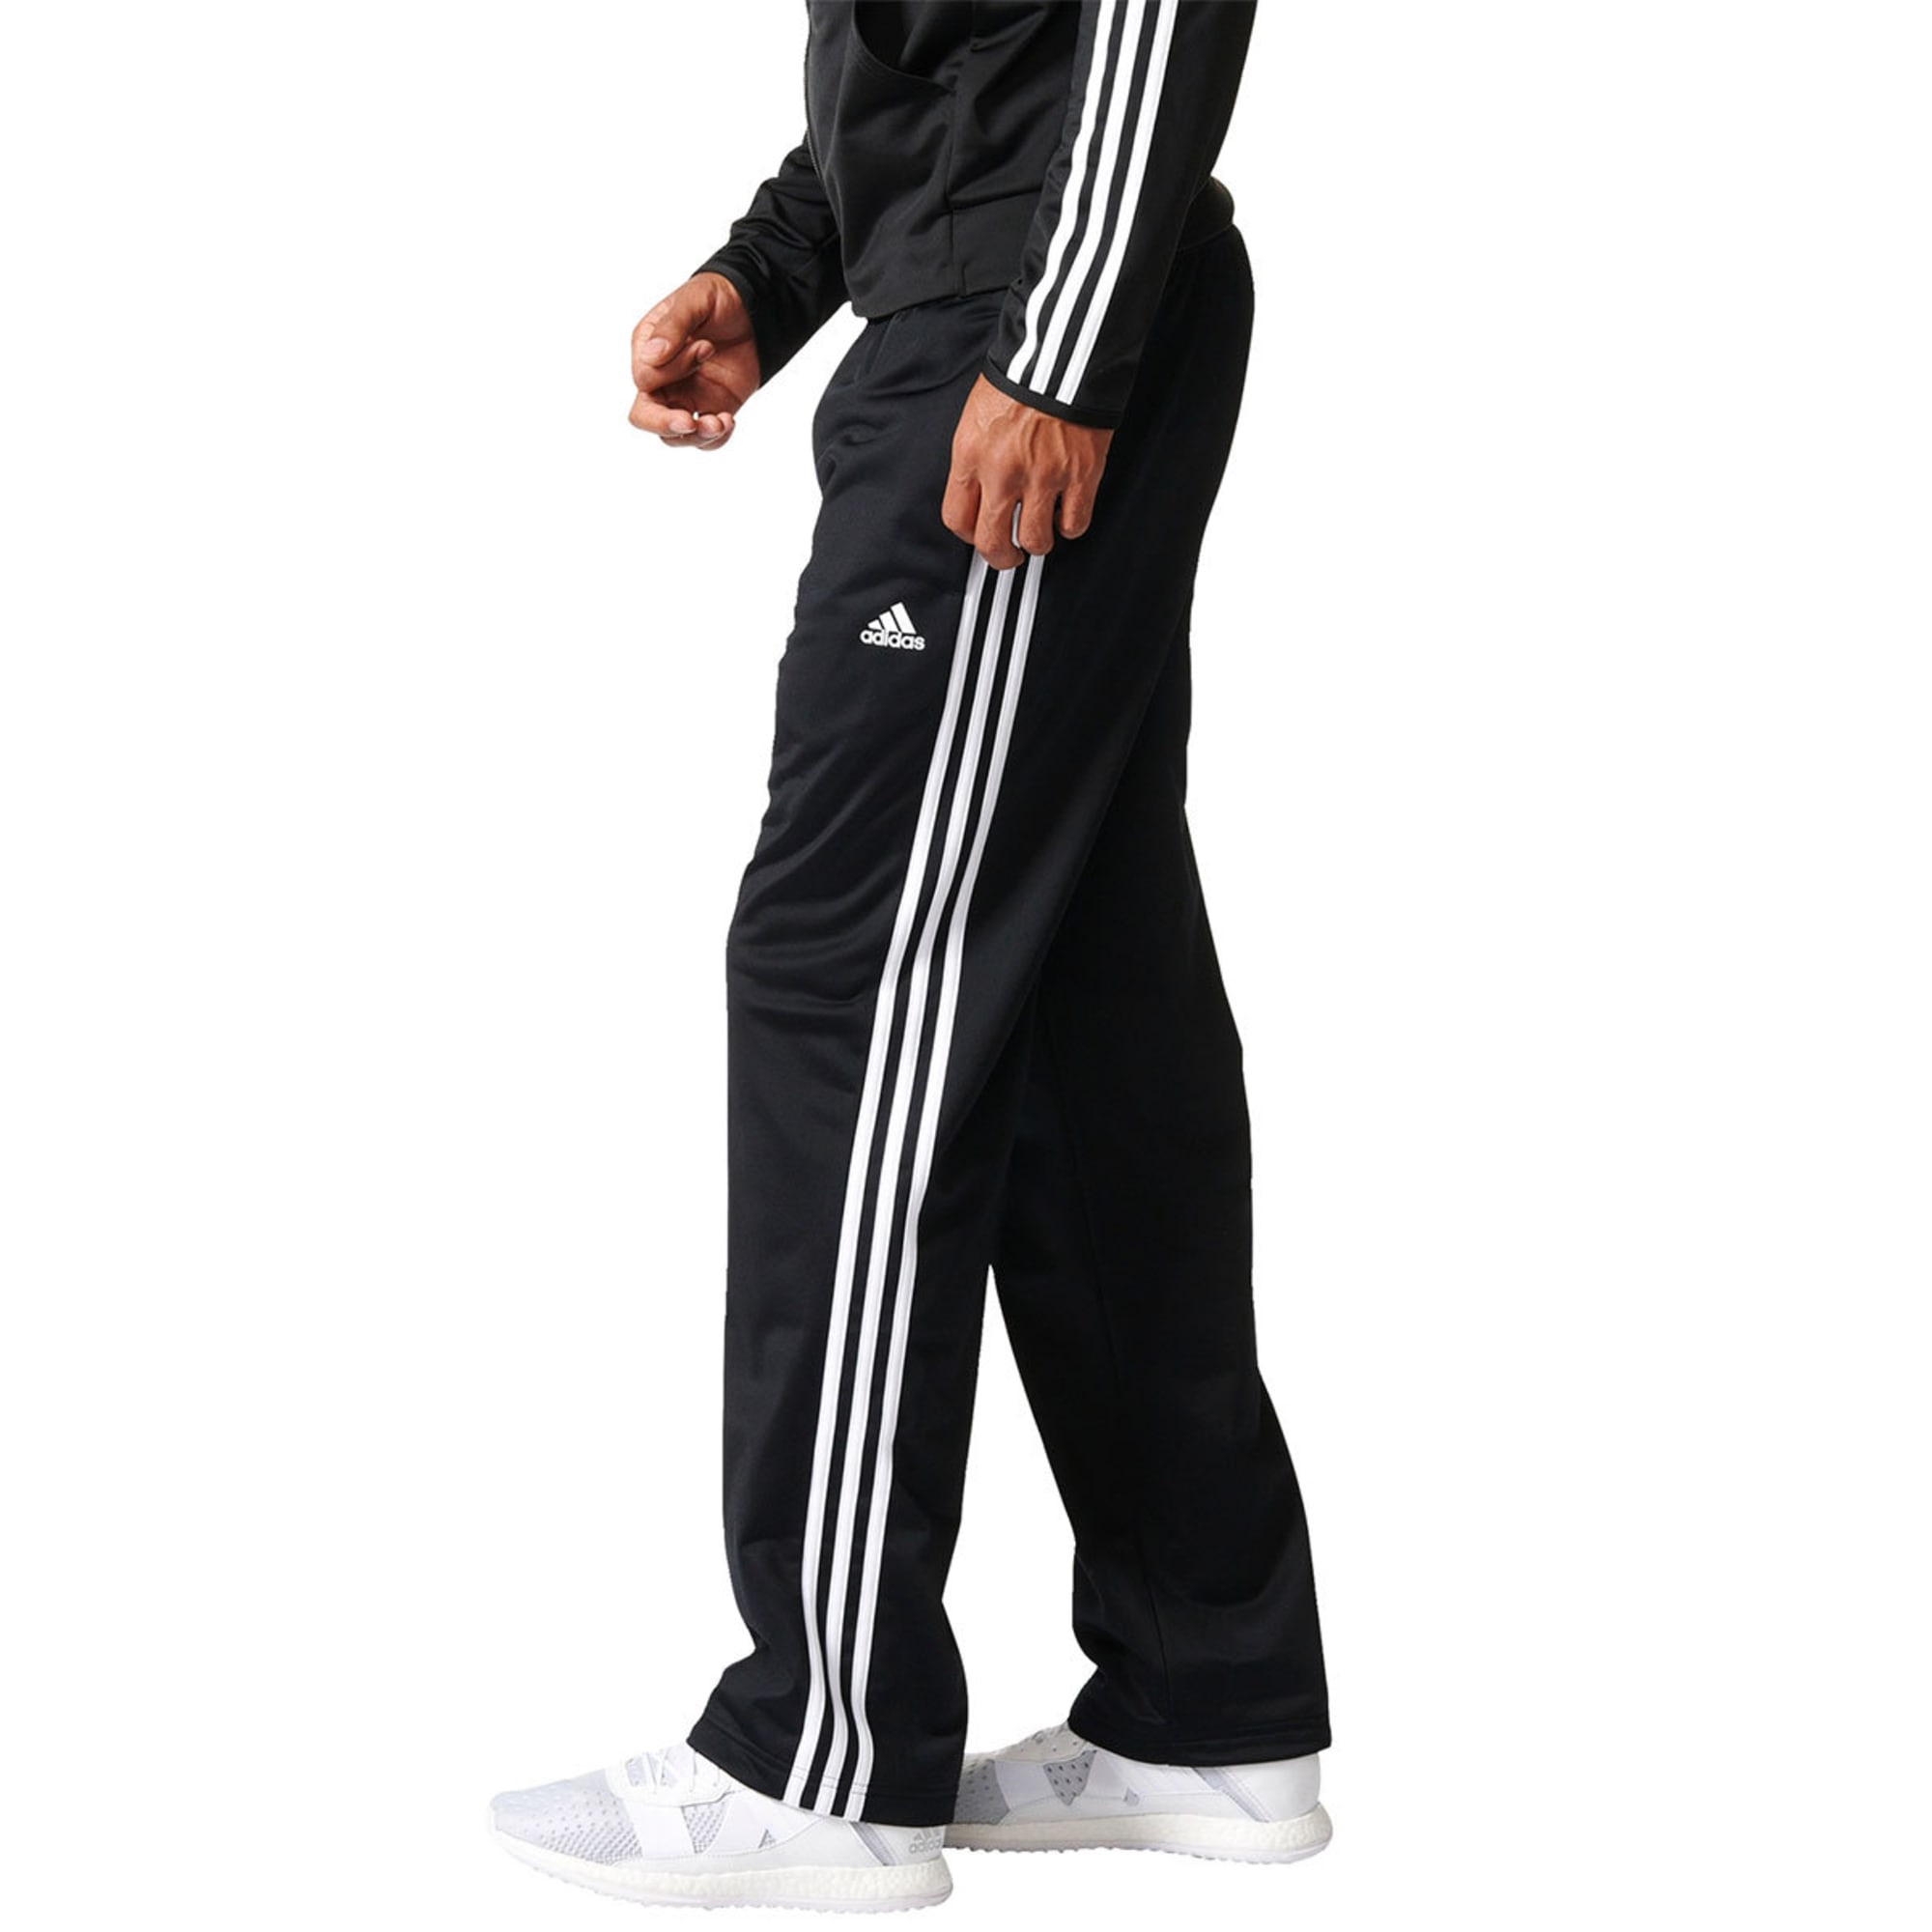 Pants adidas Essentials 3S Regular Fit Tricot Pant BK7404